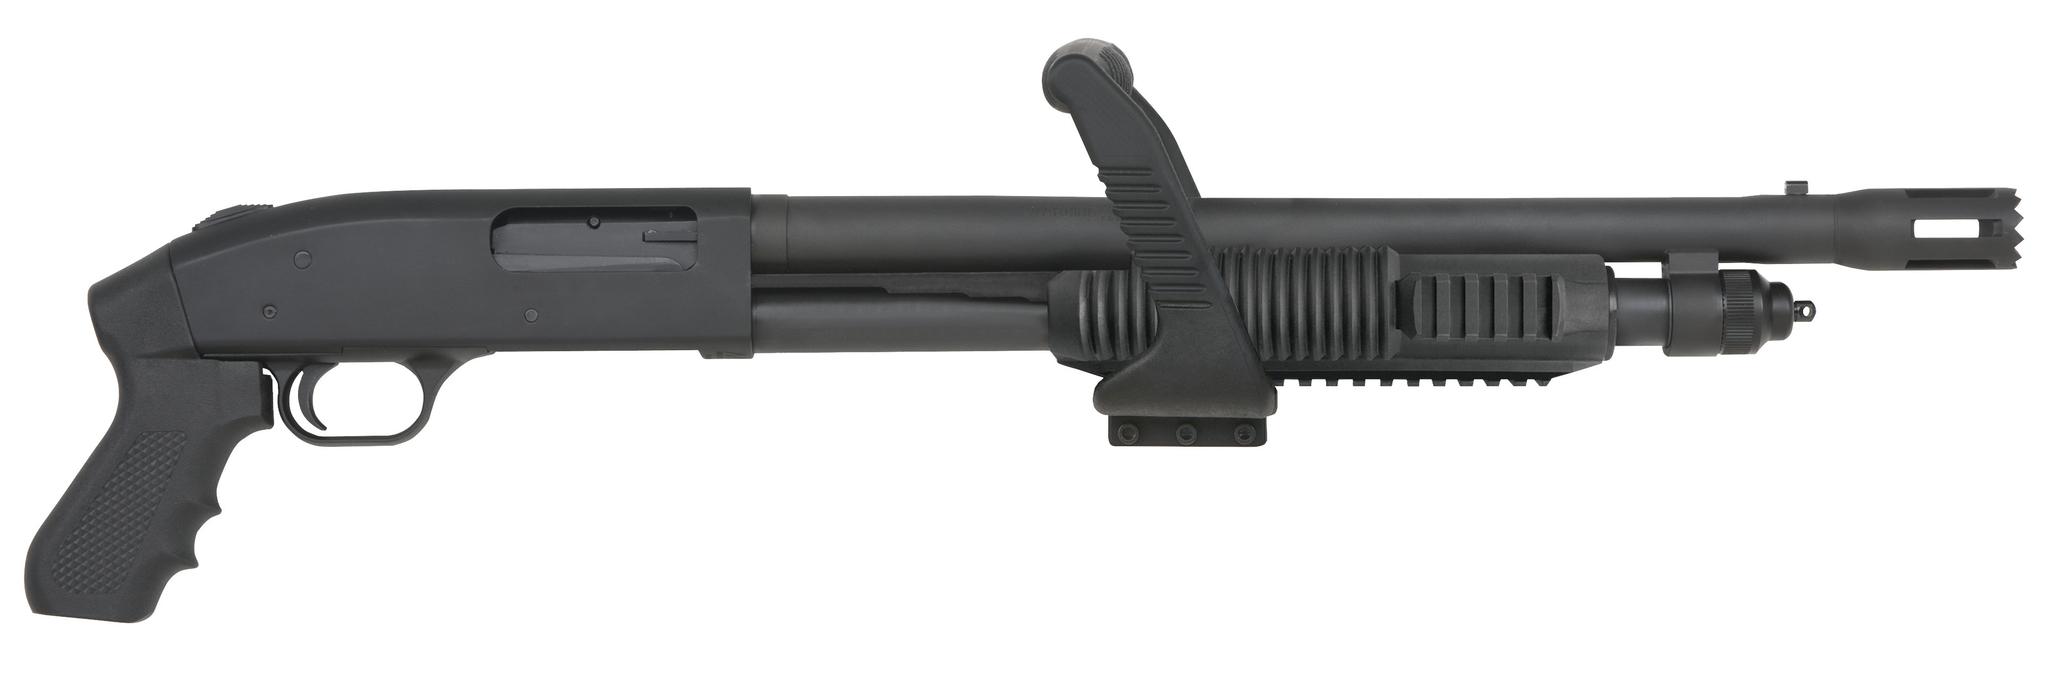 Mossberg 590 Chainsaw 12 Gauge